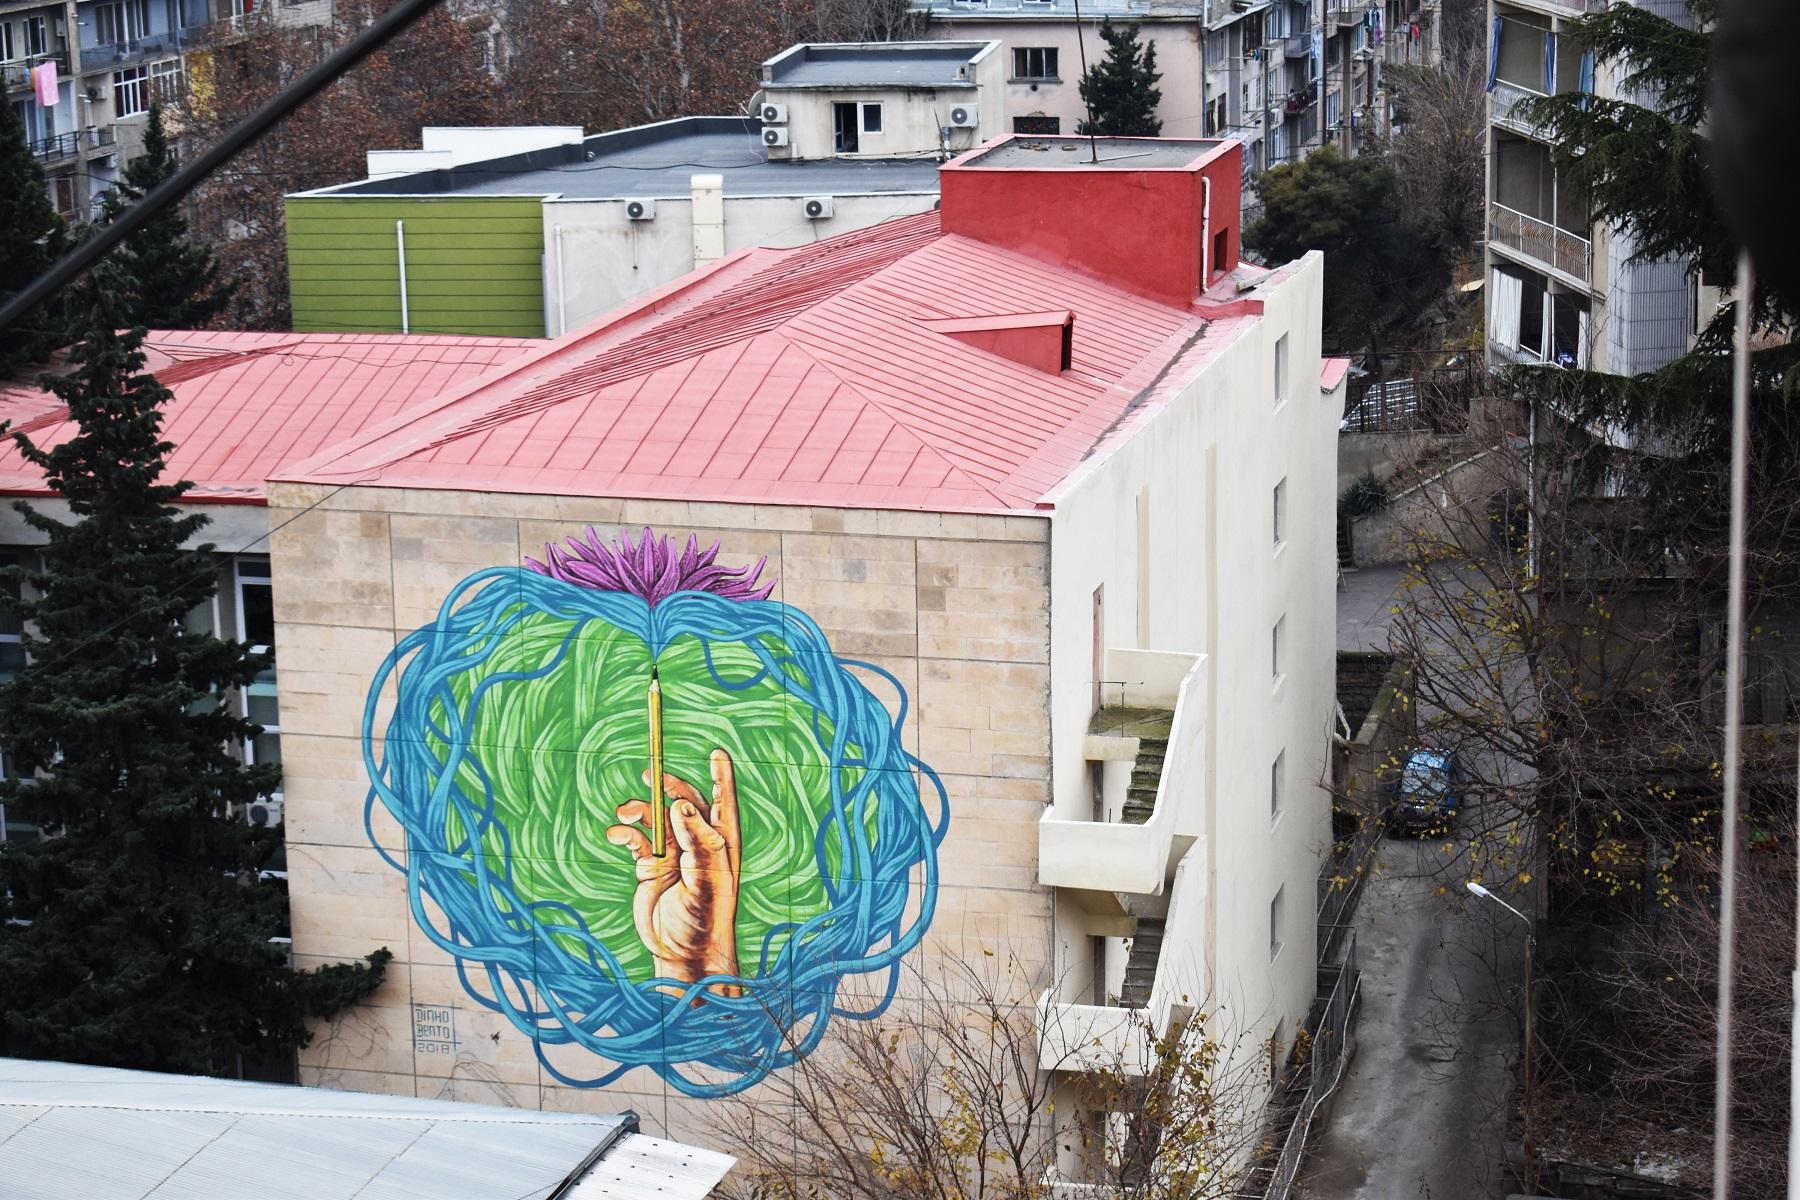 2 #art featured, арт, Бразилия, германия, граффити, Грузия, Дино Бенто, искусство, Лапиз, мурал, Саша Корбан, стрит-арт, тбилиси, украина